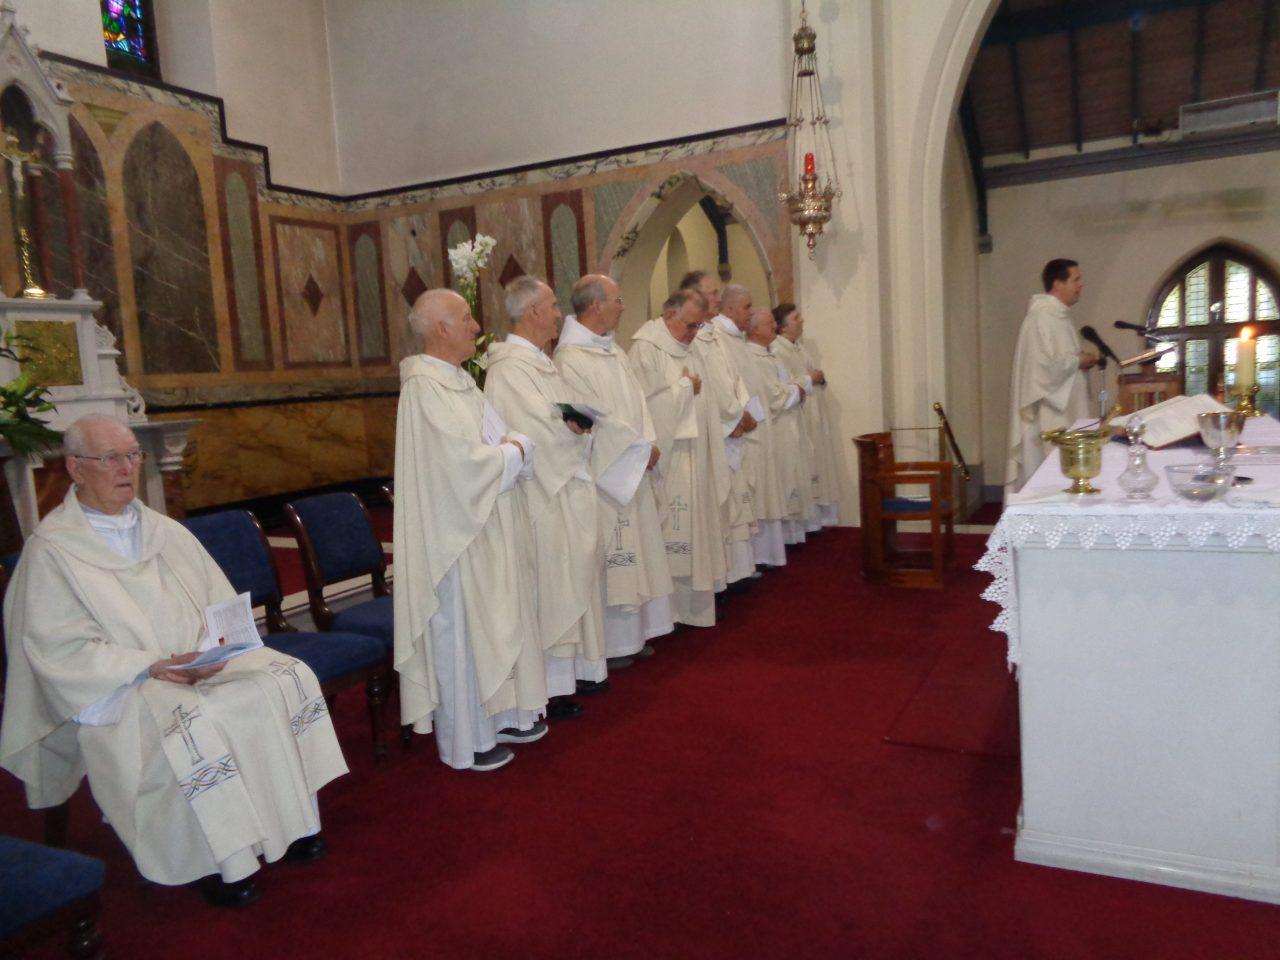 Marist Confreres Concelebrating Fr. Tom's First Mass